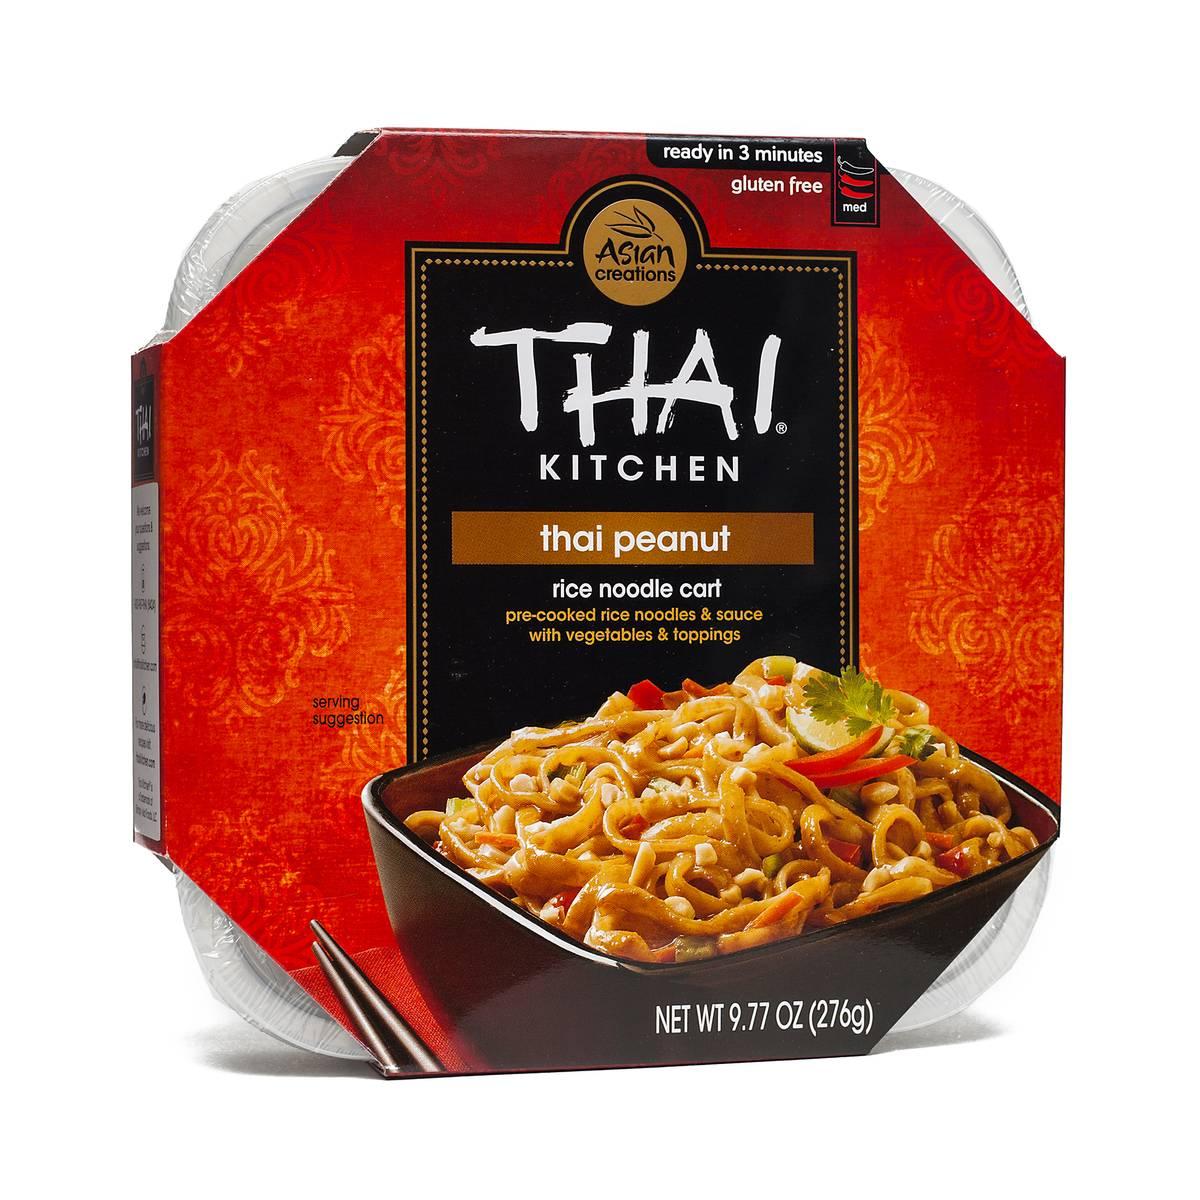 Thai Peanut Noodles & Sauce By Thai Kitchen